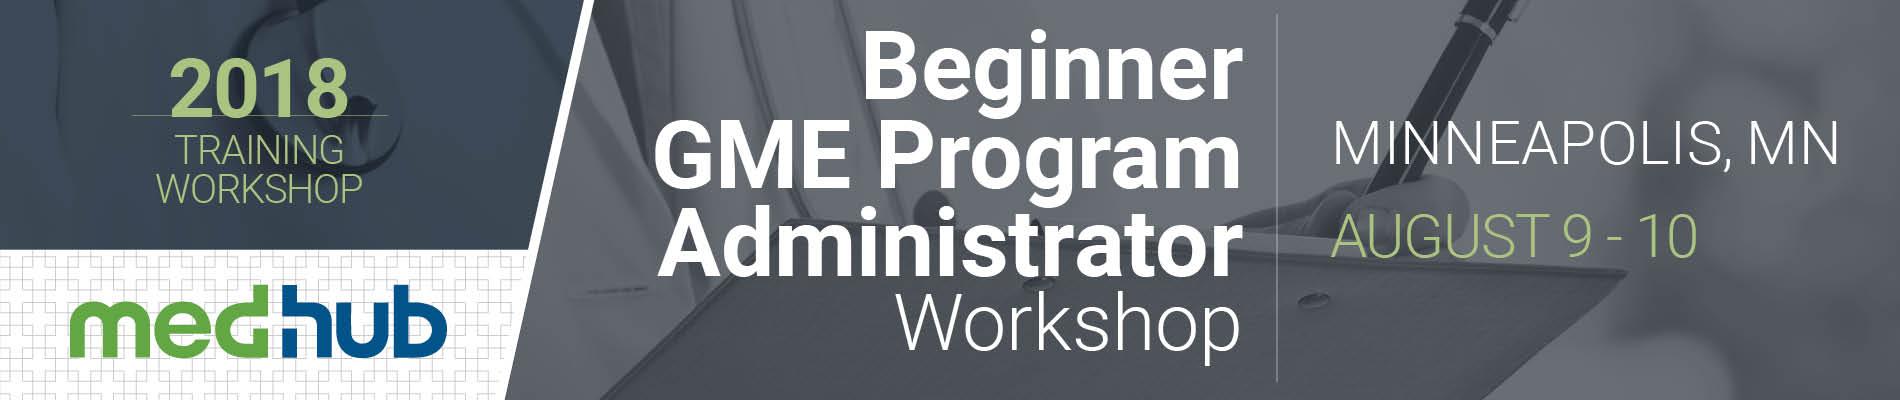 MedHub New GME Program Administrator Workshop (August 9, 10)